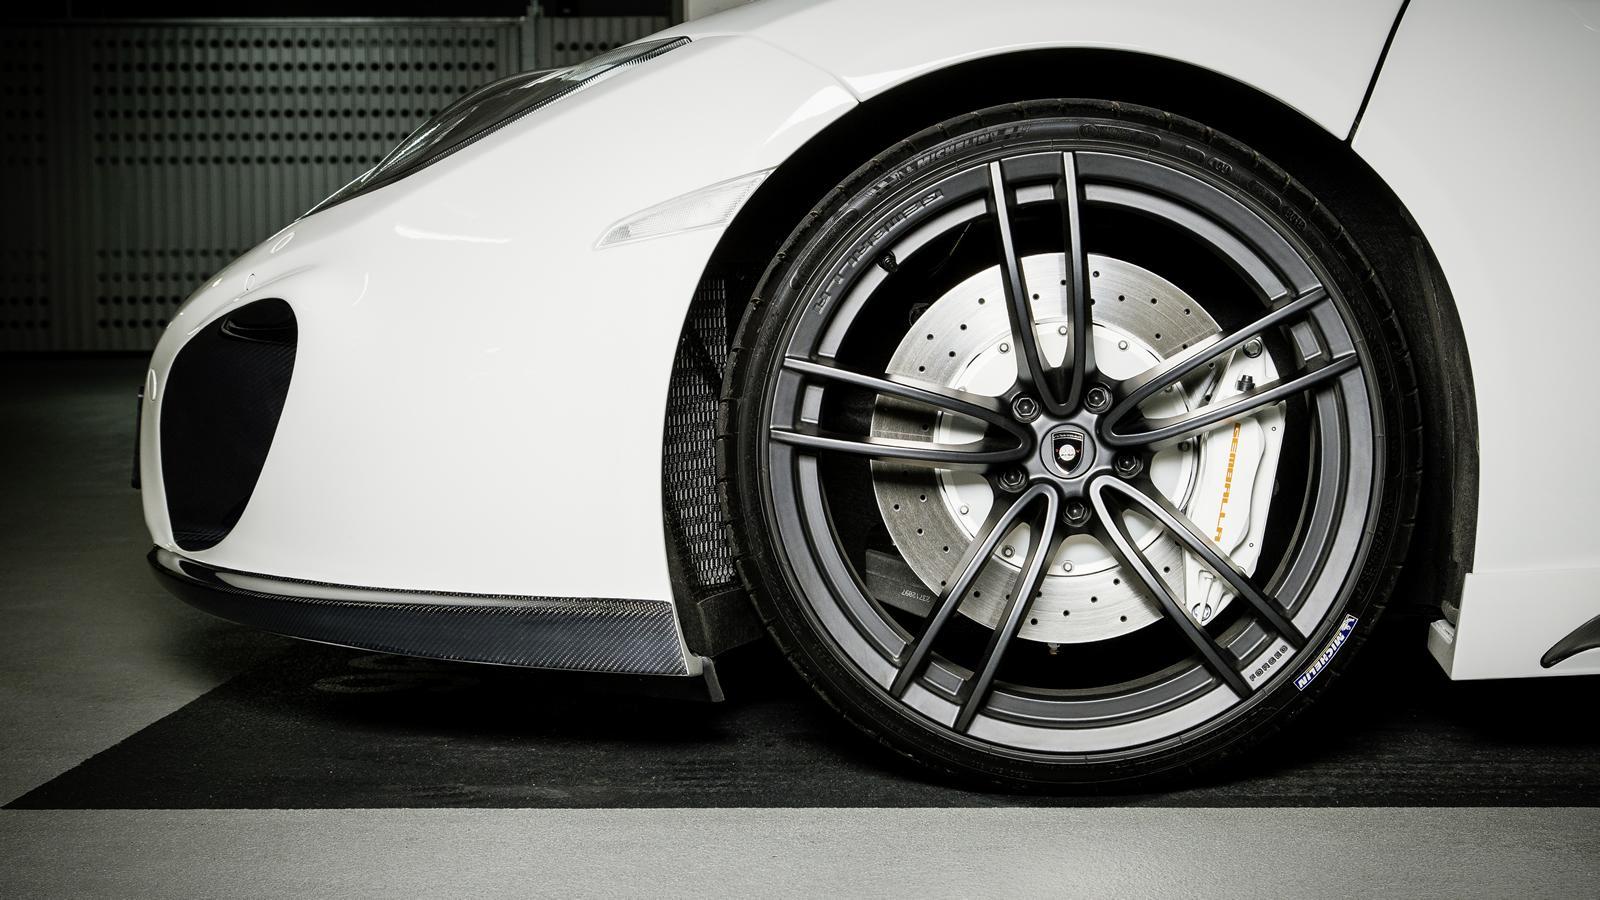 gemballa mclaren mp4-12c spider styling kit announced   performancedrive